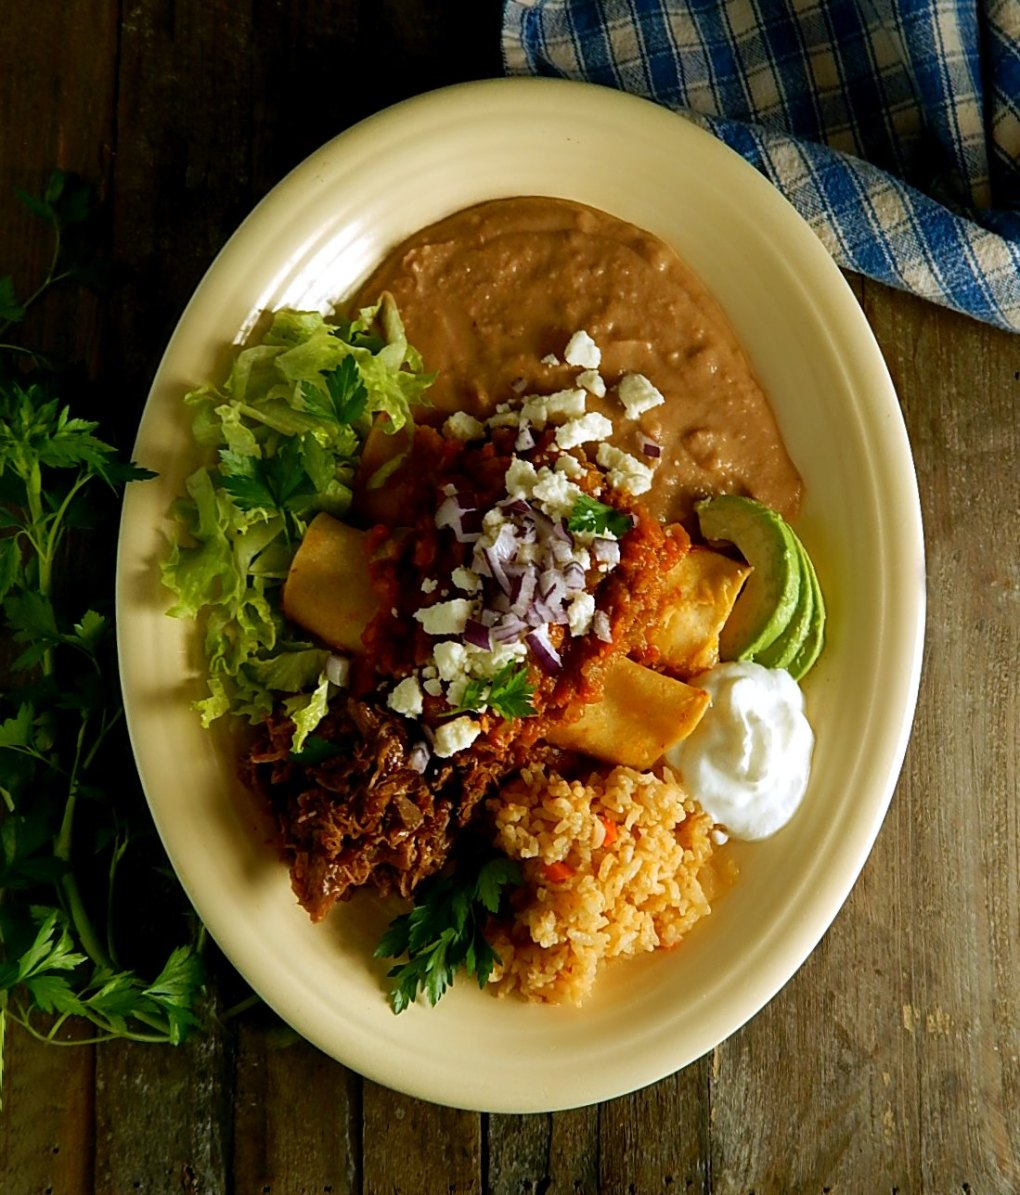 Three Cheese Enchiladas with Braised Pork & Ranchero Sauce